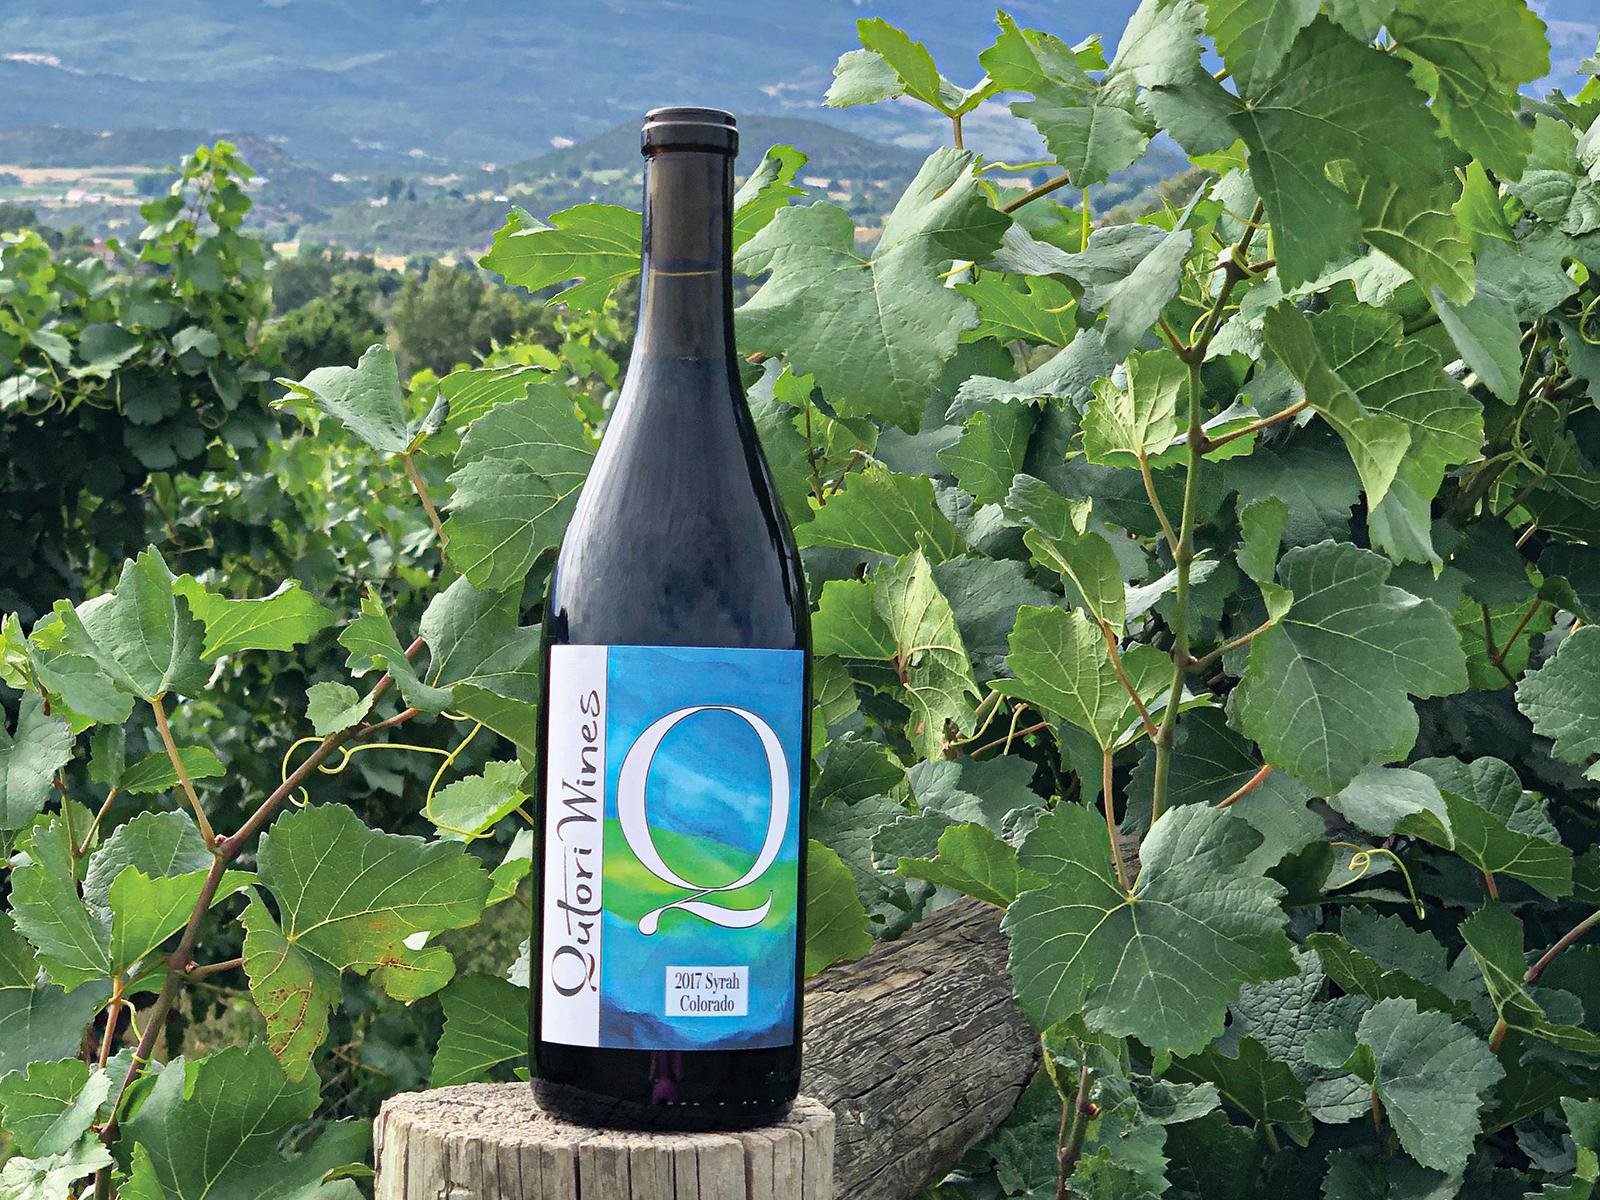 Qutori Wines